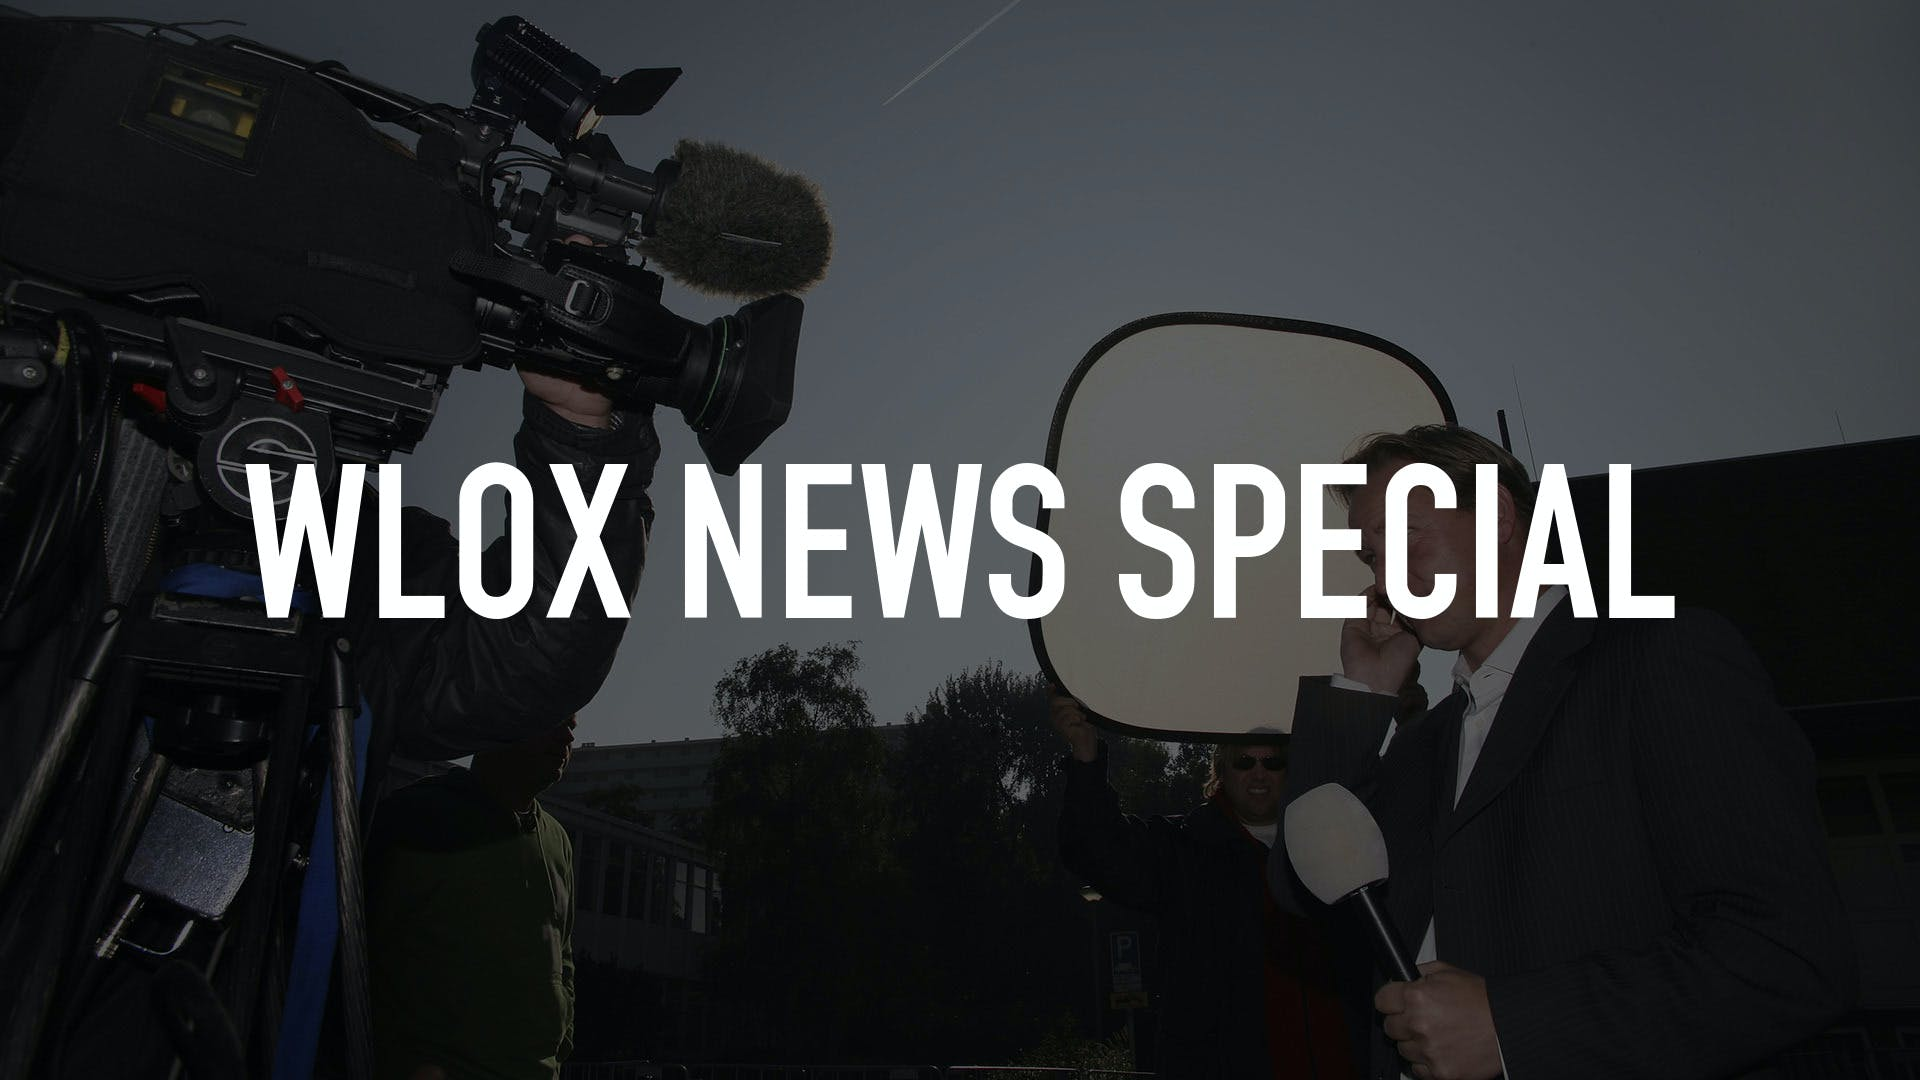 Watch WLOX News Special   Stream on fuboTV (Free Trial)